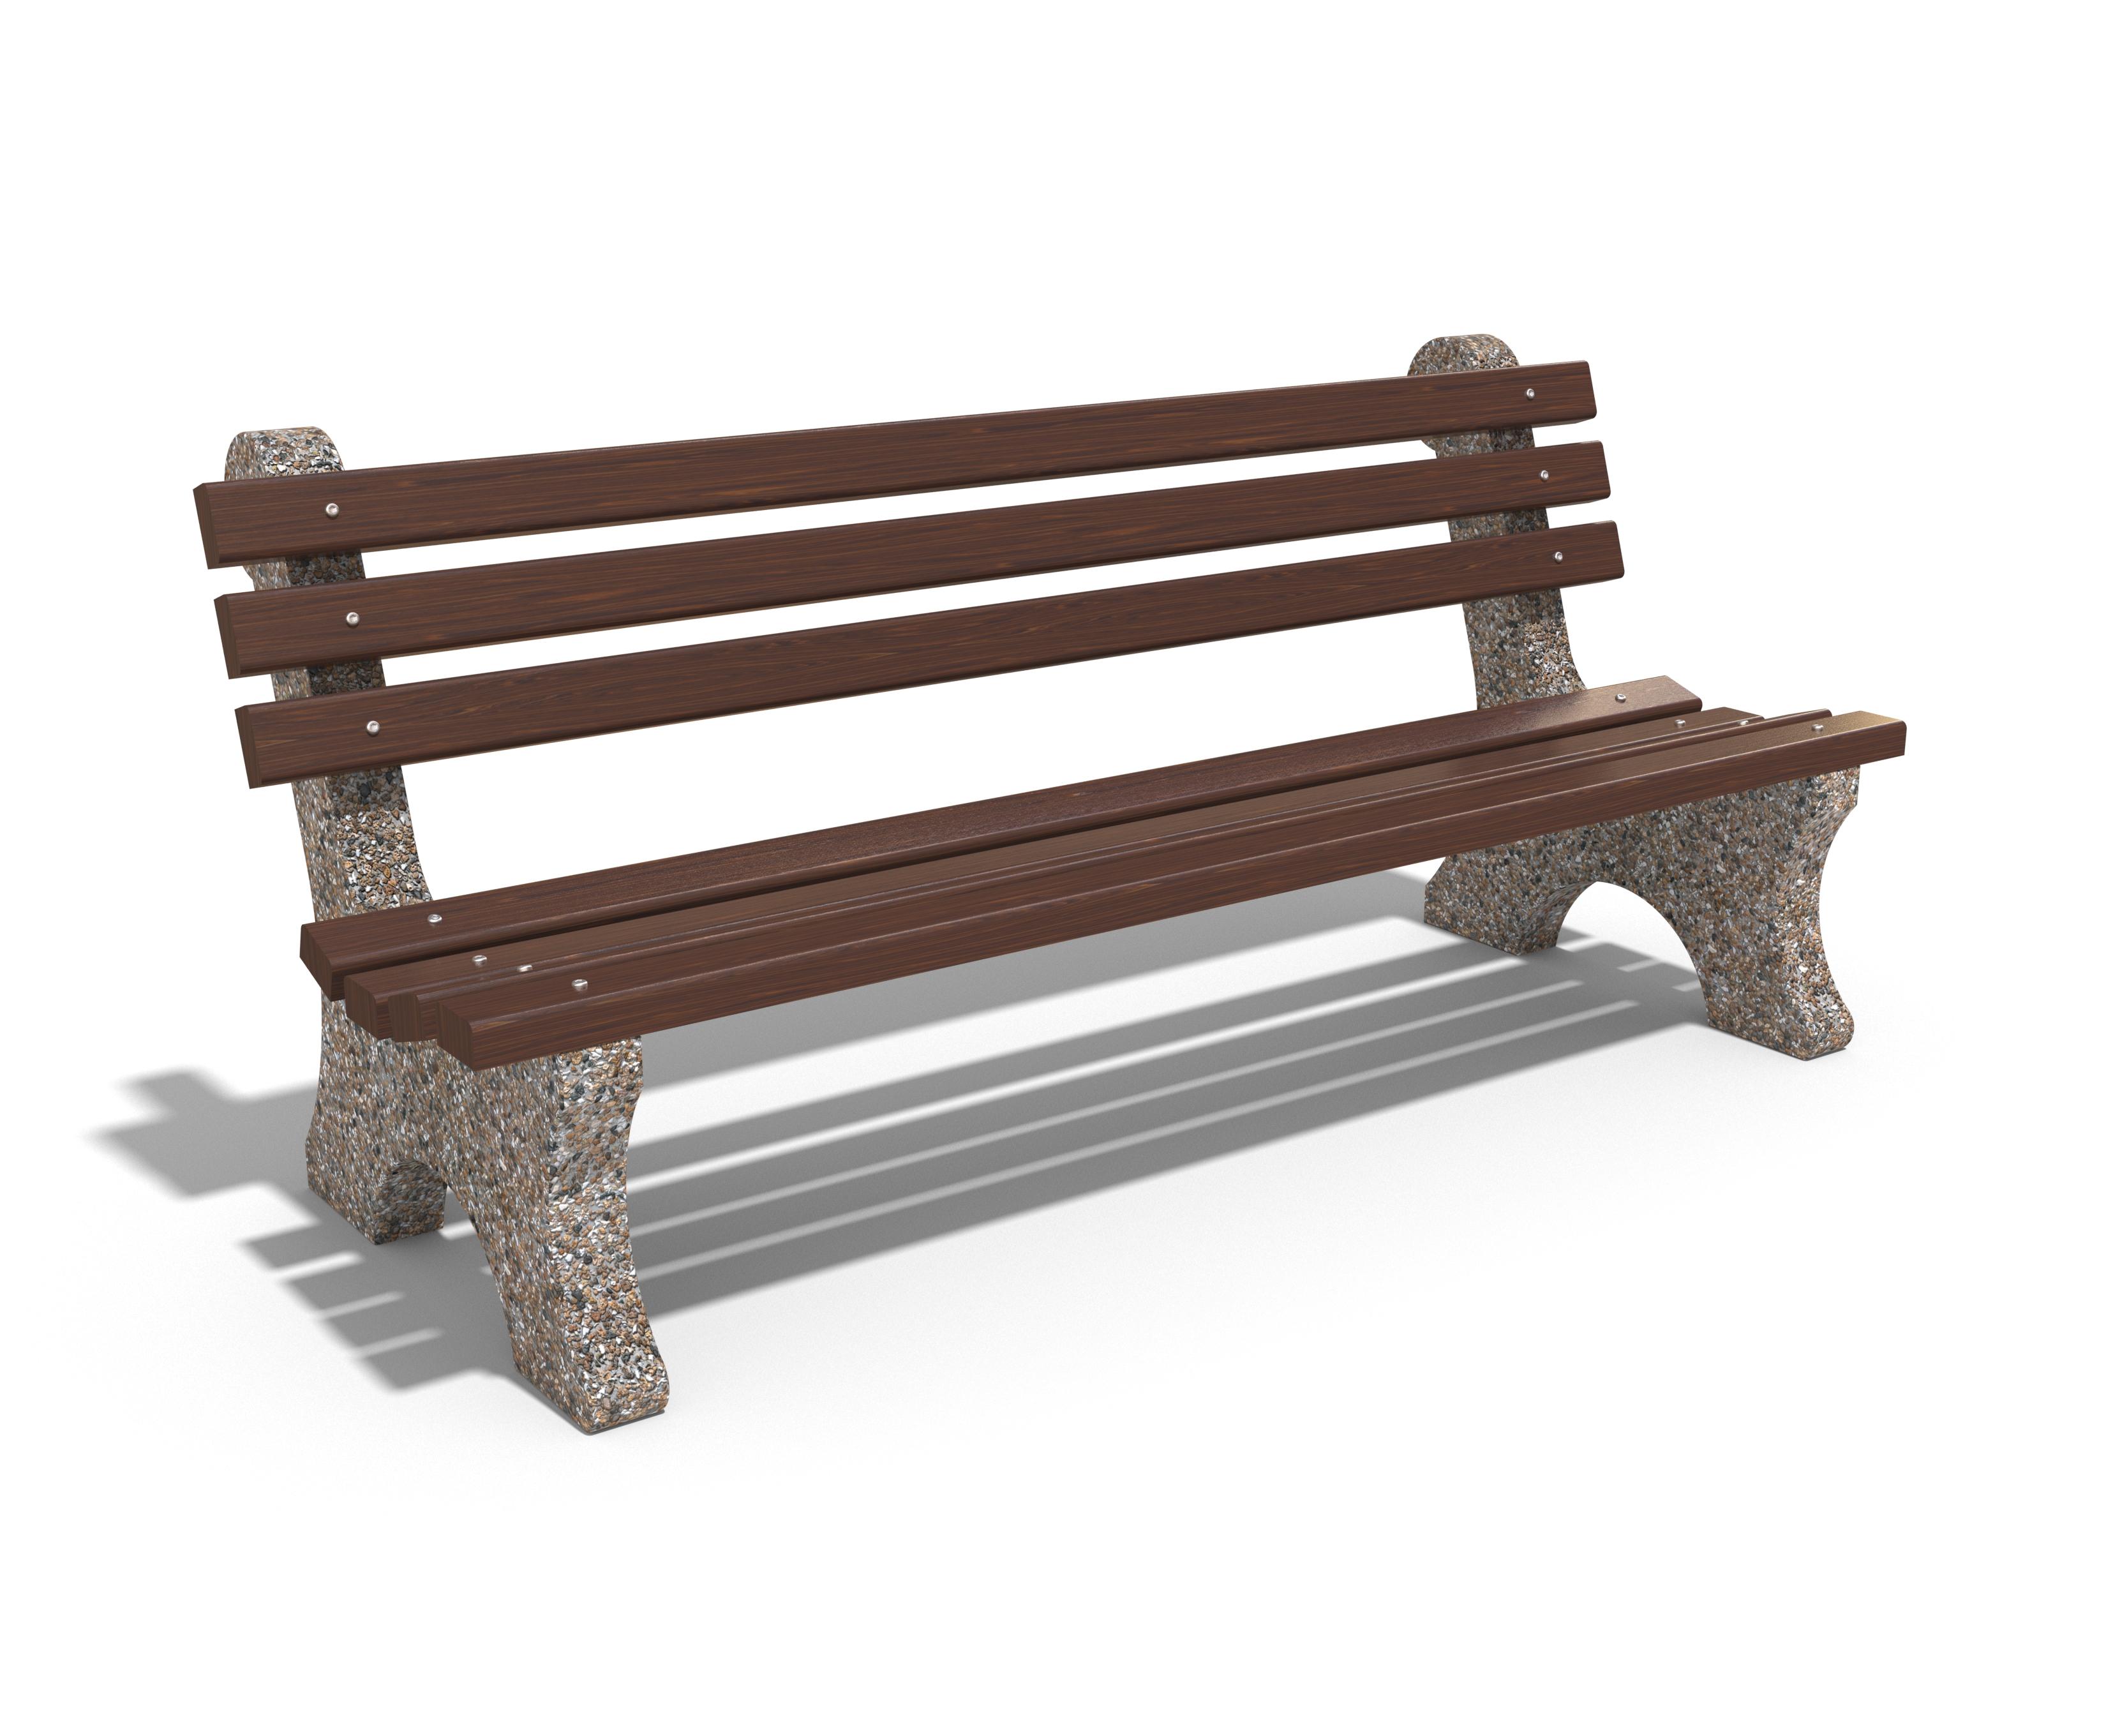 bank, parkbank, betonbank, bänke, sitzgelegenheiten, outdoormöbel